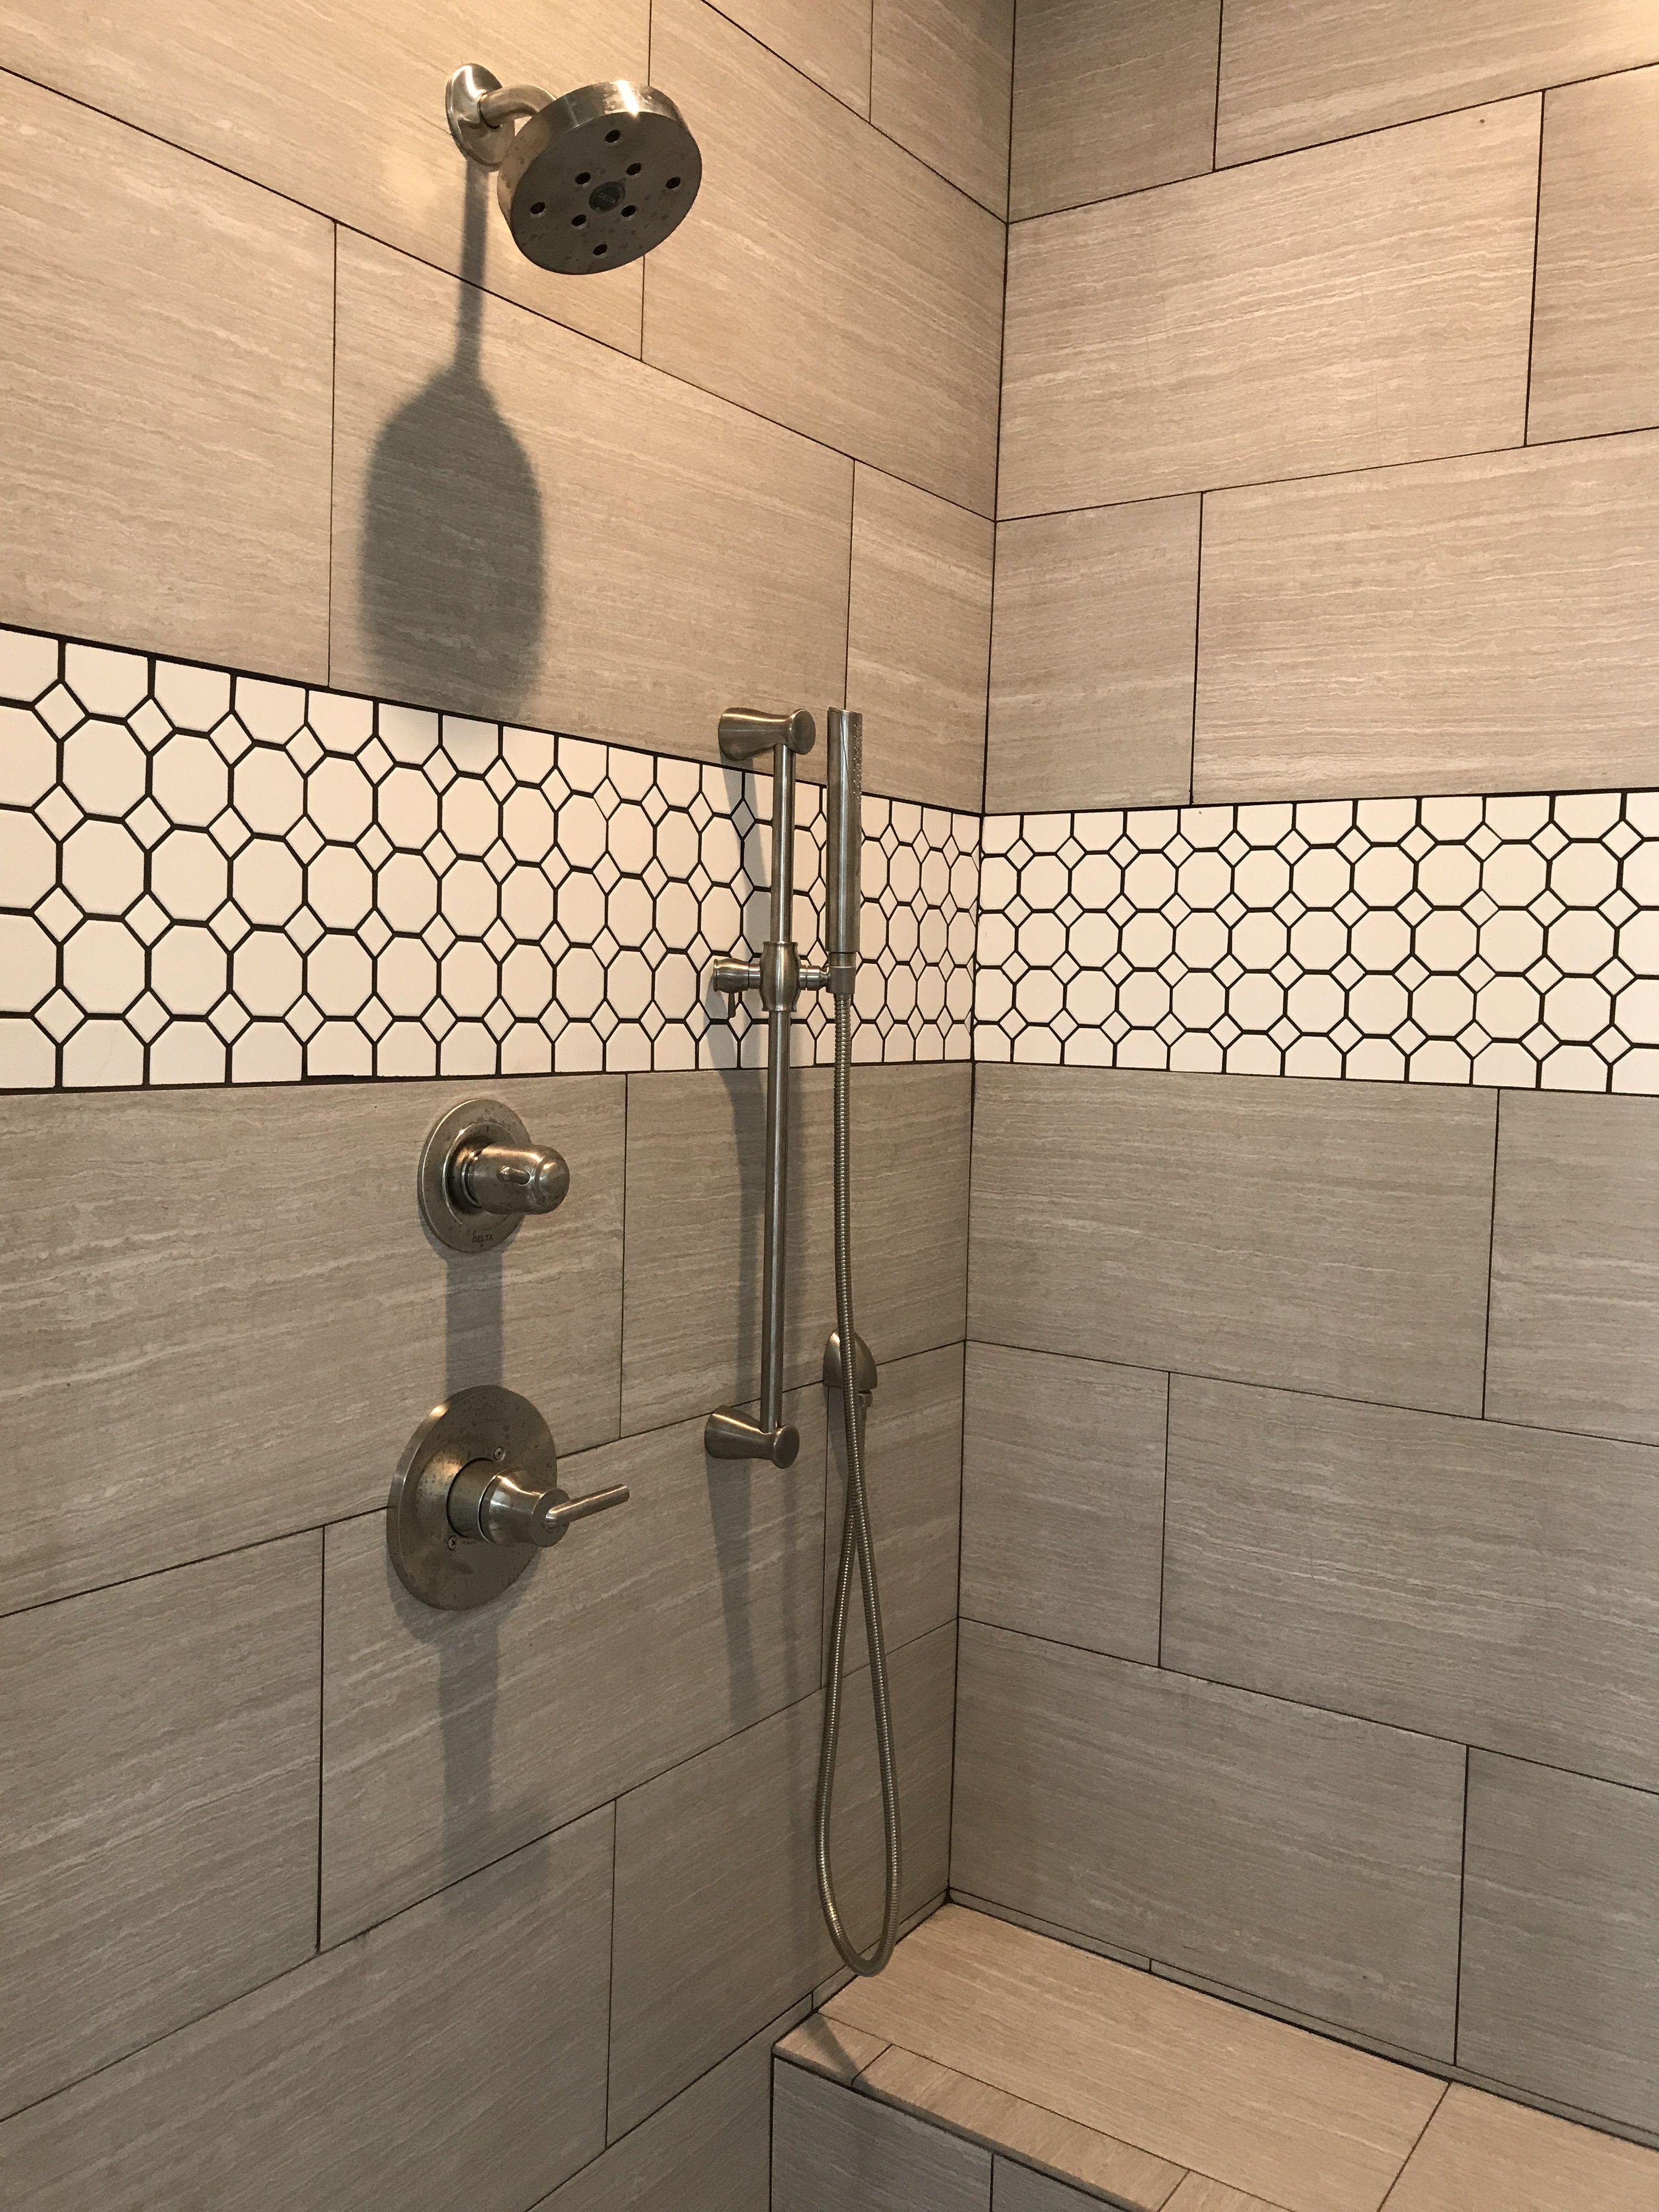 Master Bathroom Shower Delta Trinsic Faucet And Handheld